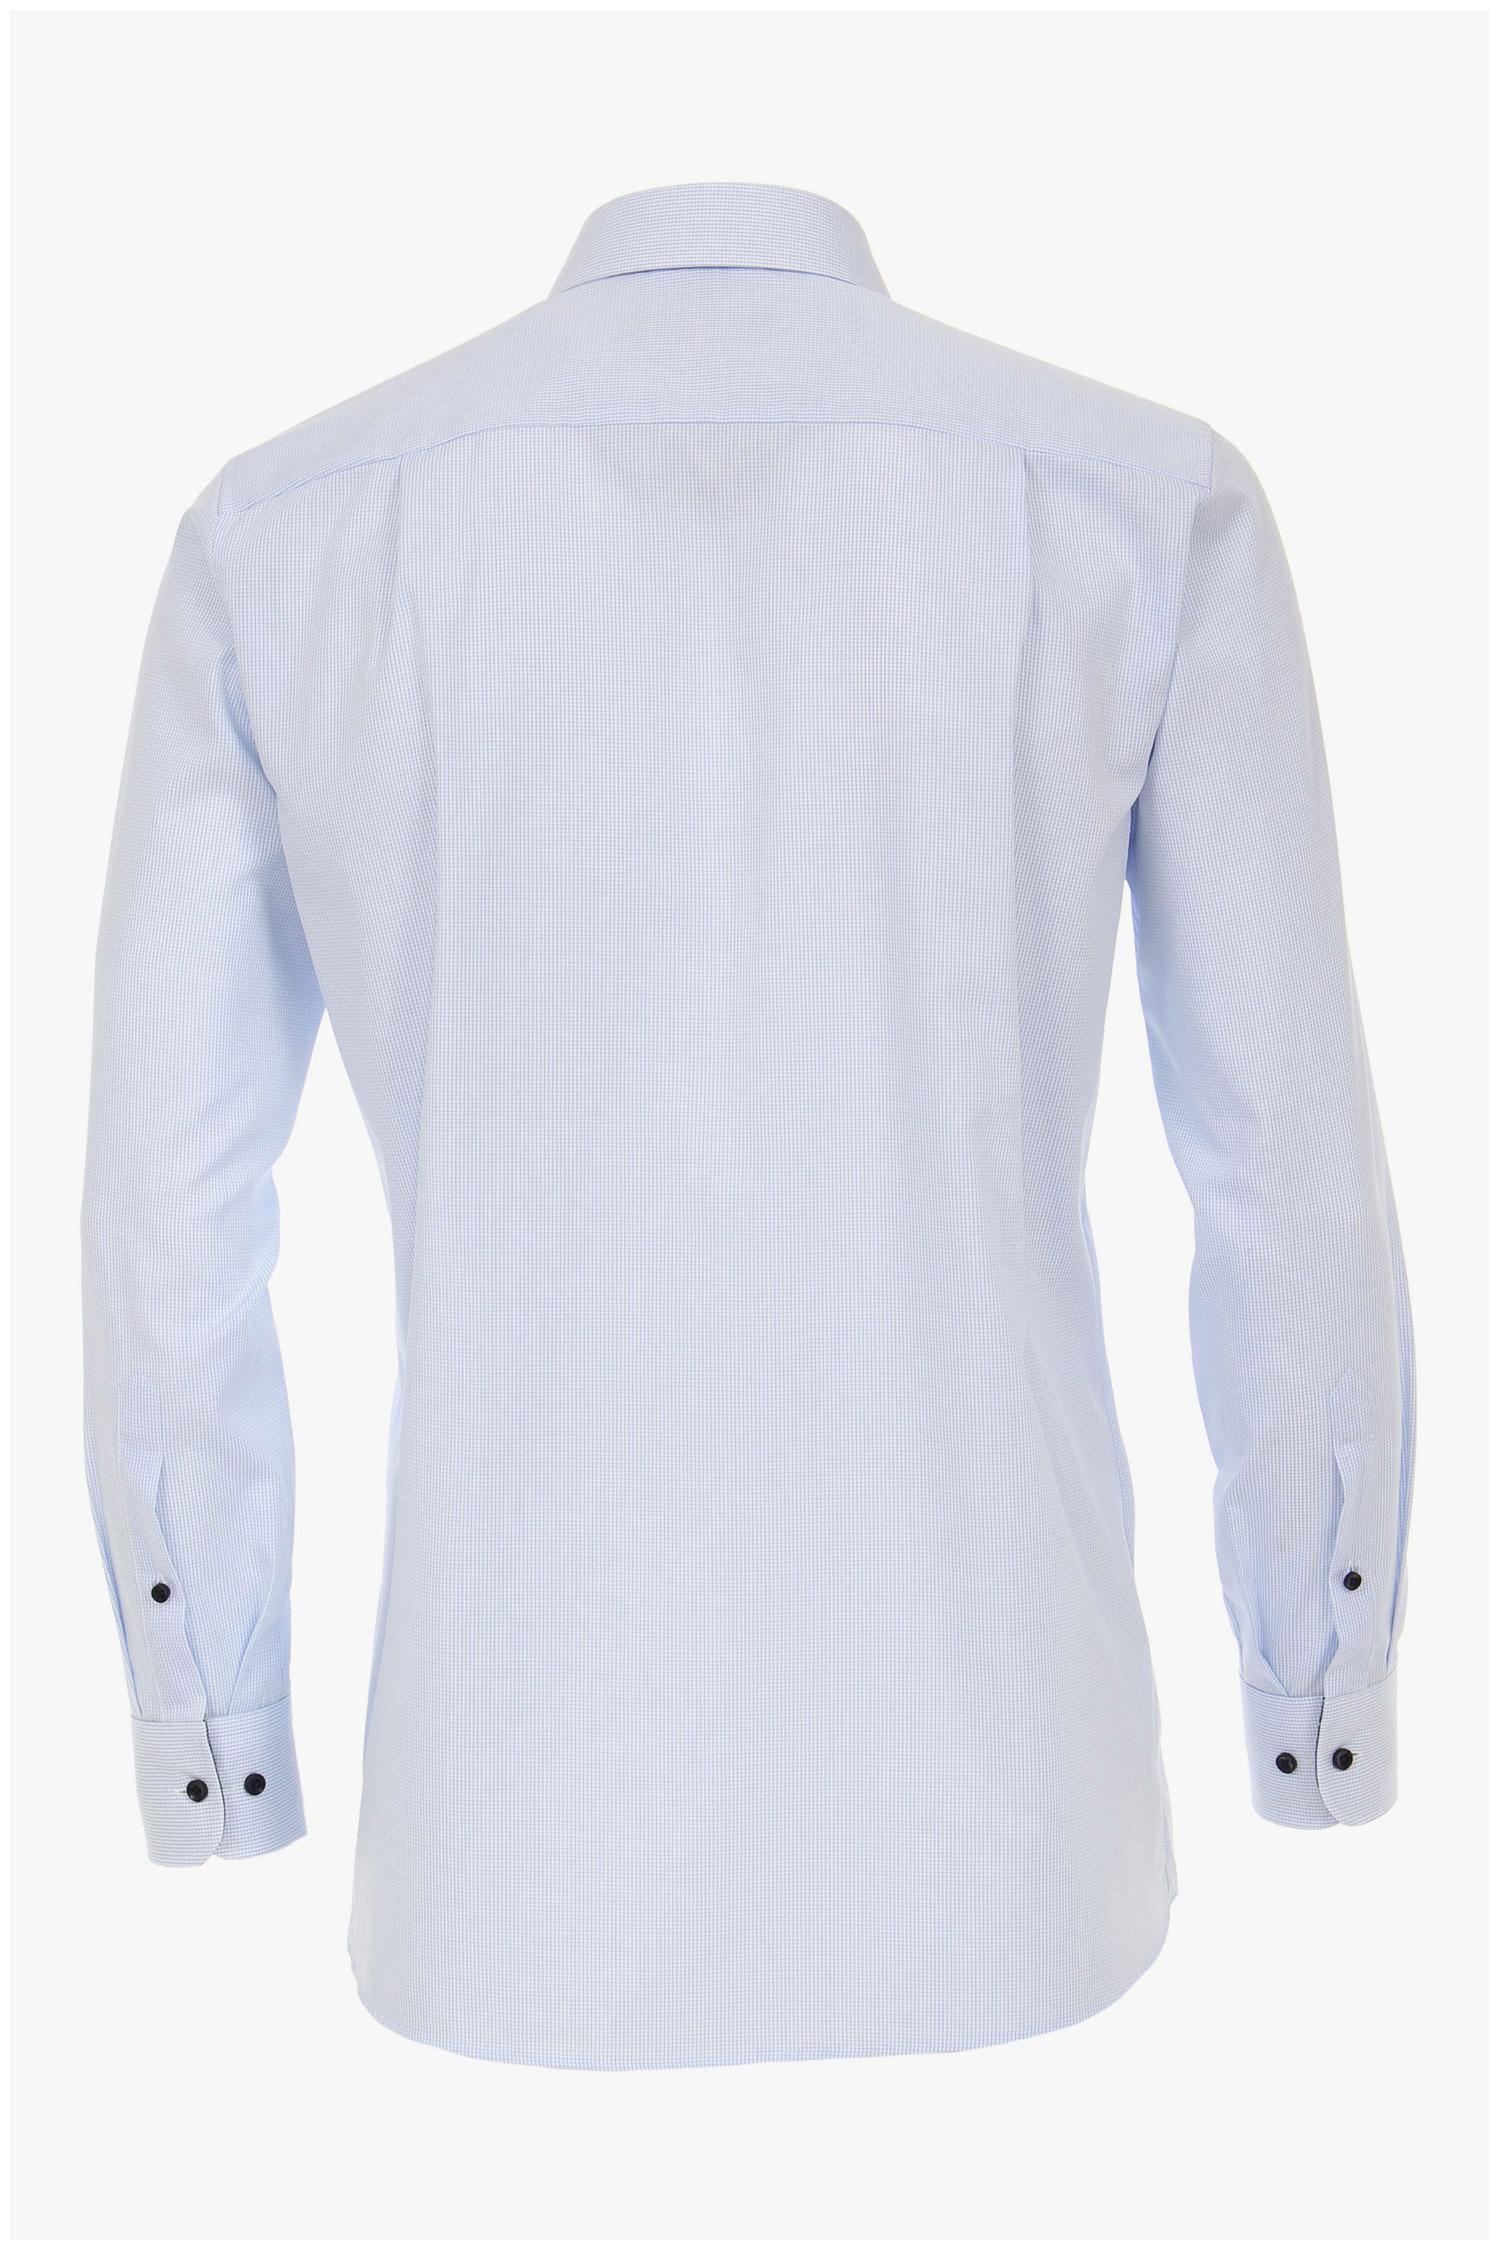 Camisas, Vestir Manga Larga, 110245, CELESTE | Zoom